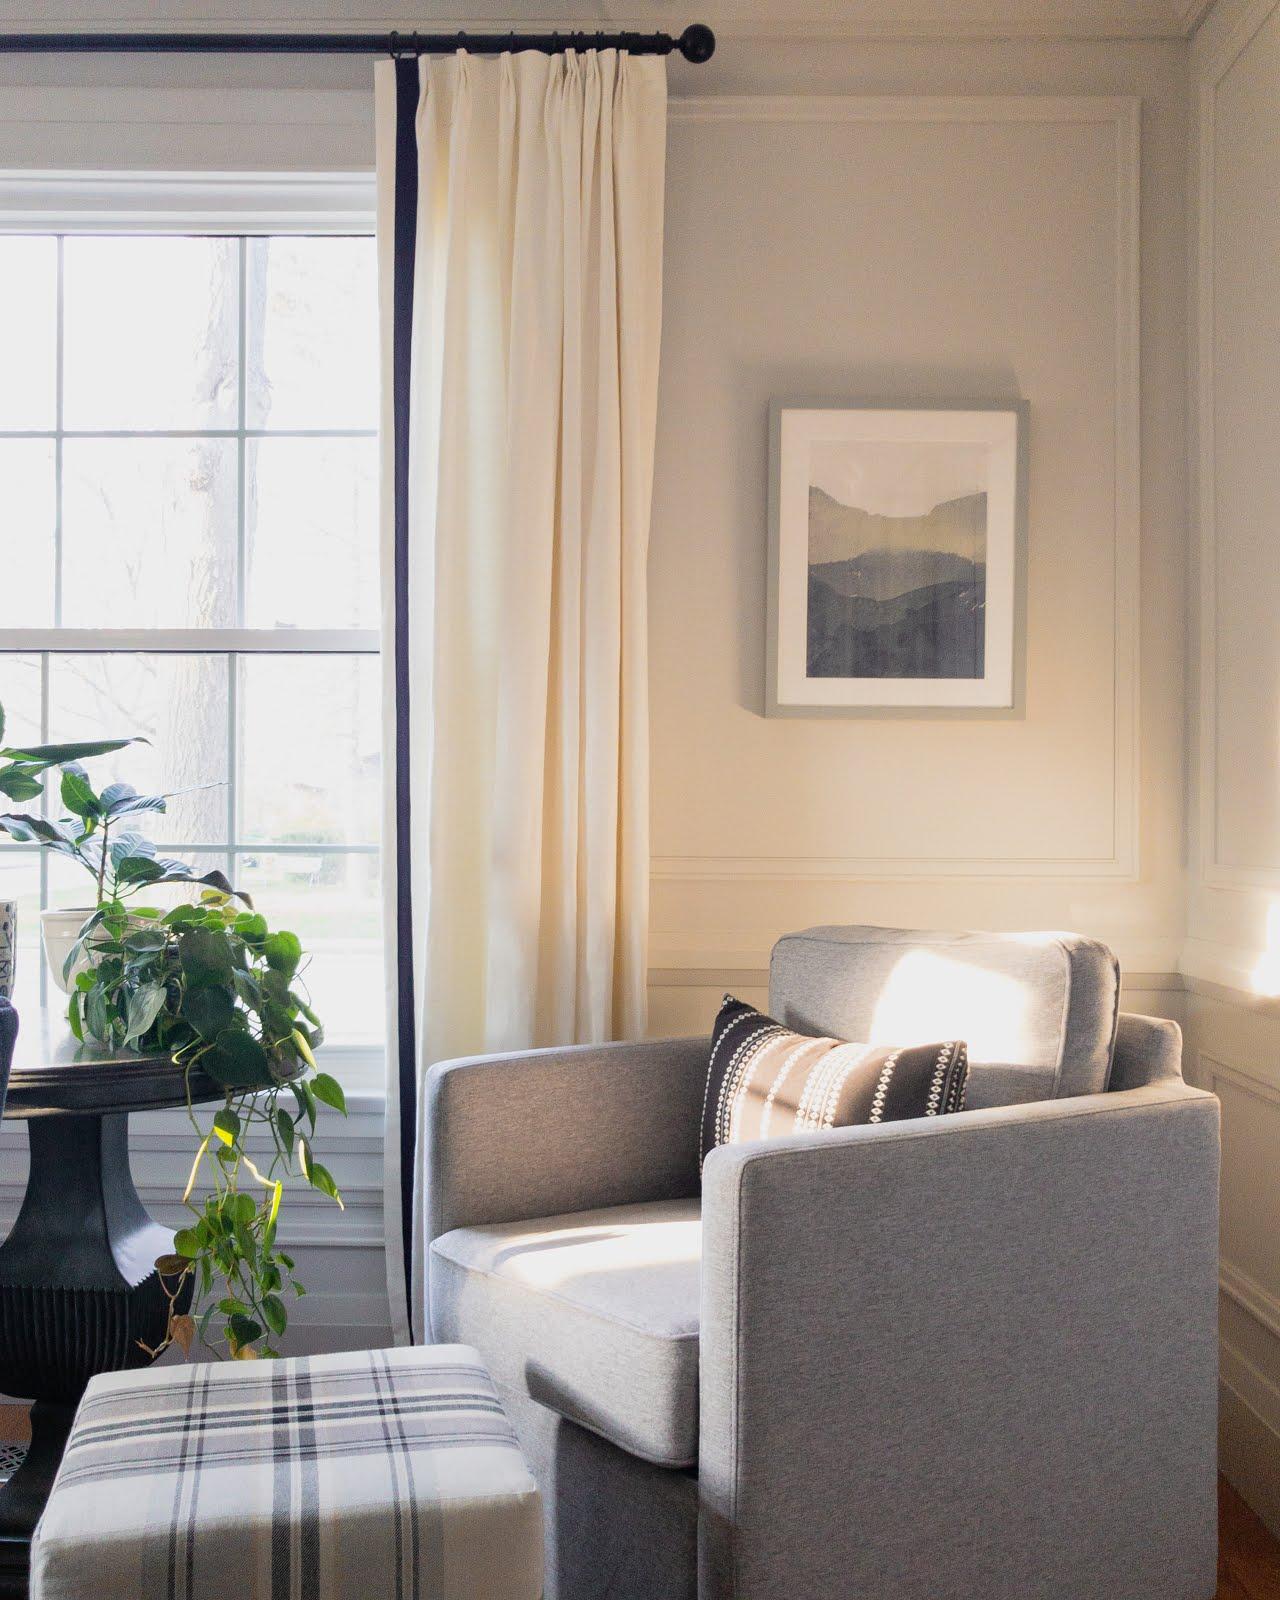 grey swivel chair, swivel chairs living room, small swivel chair, upholstered swivel chair